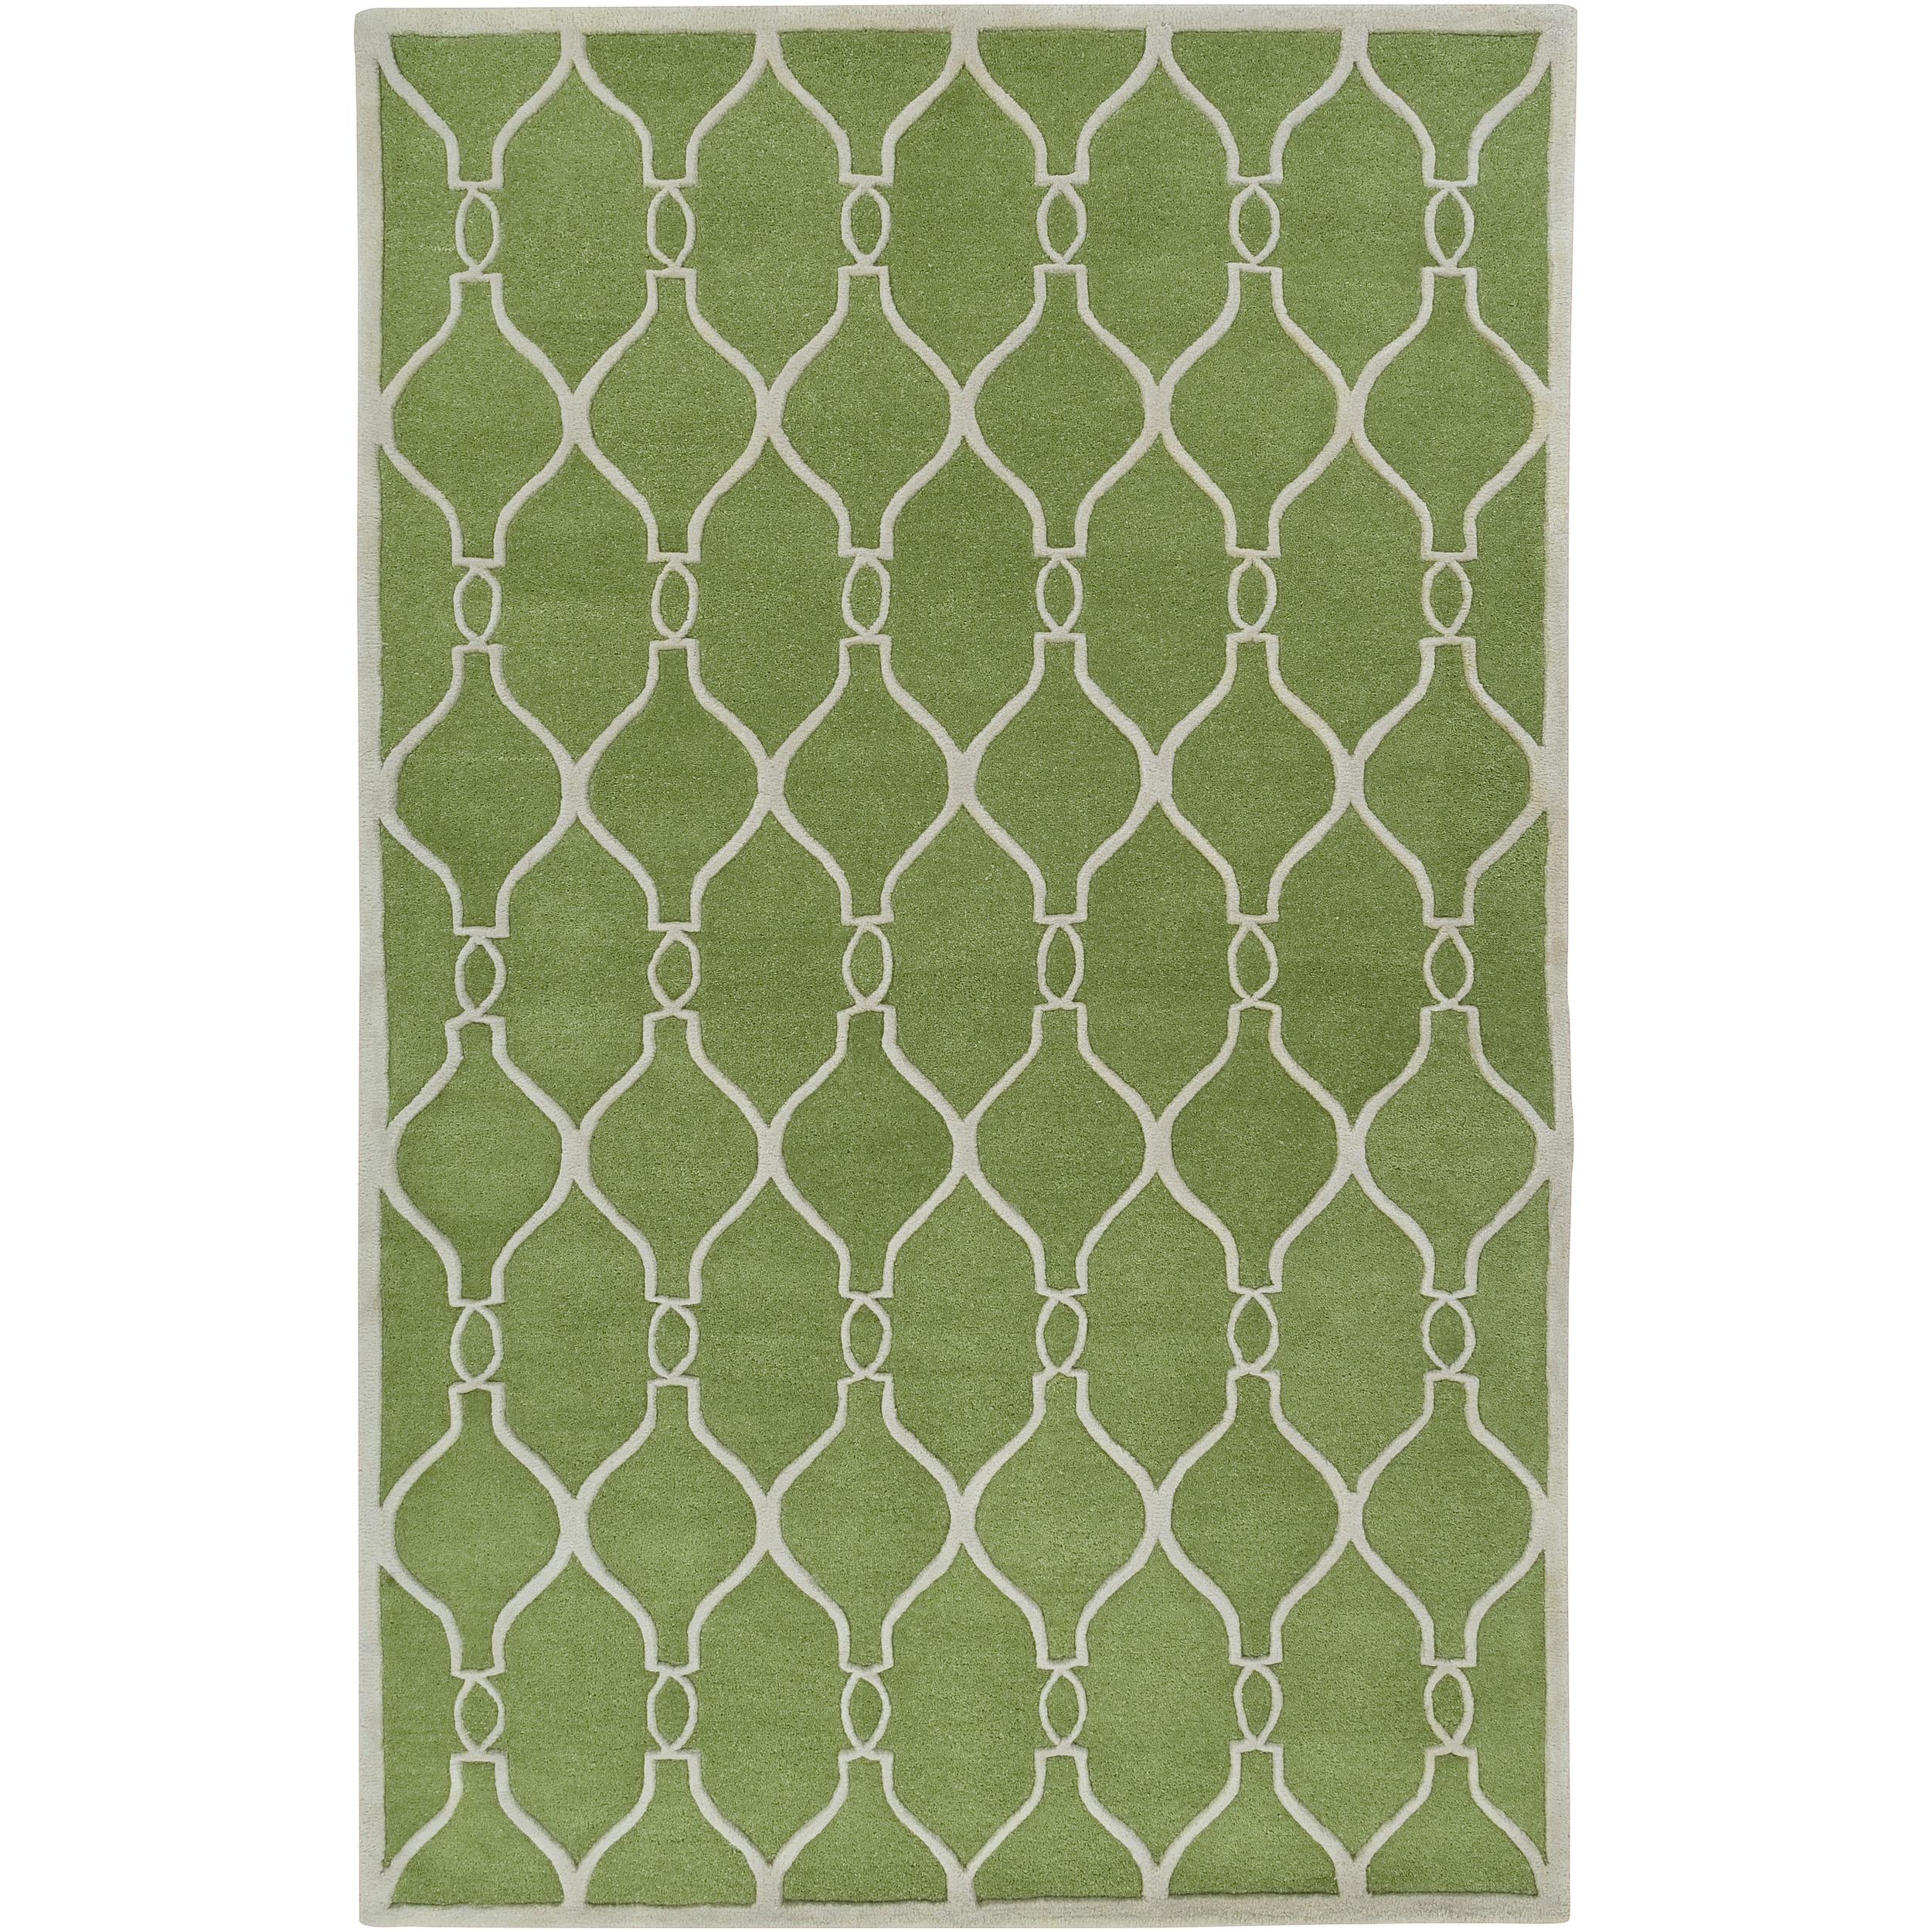 Hand-tufted Green Duvet Geometric Trellis Wool Rug (8' x 11')